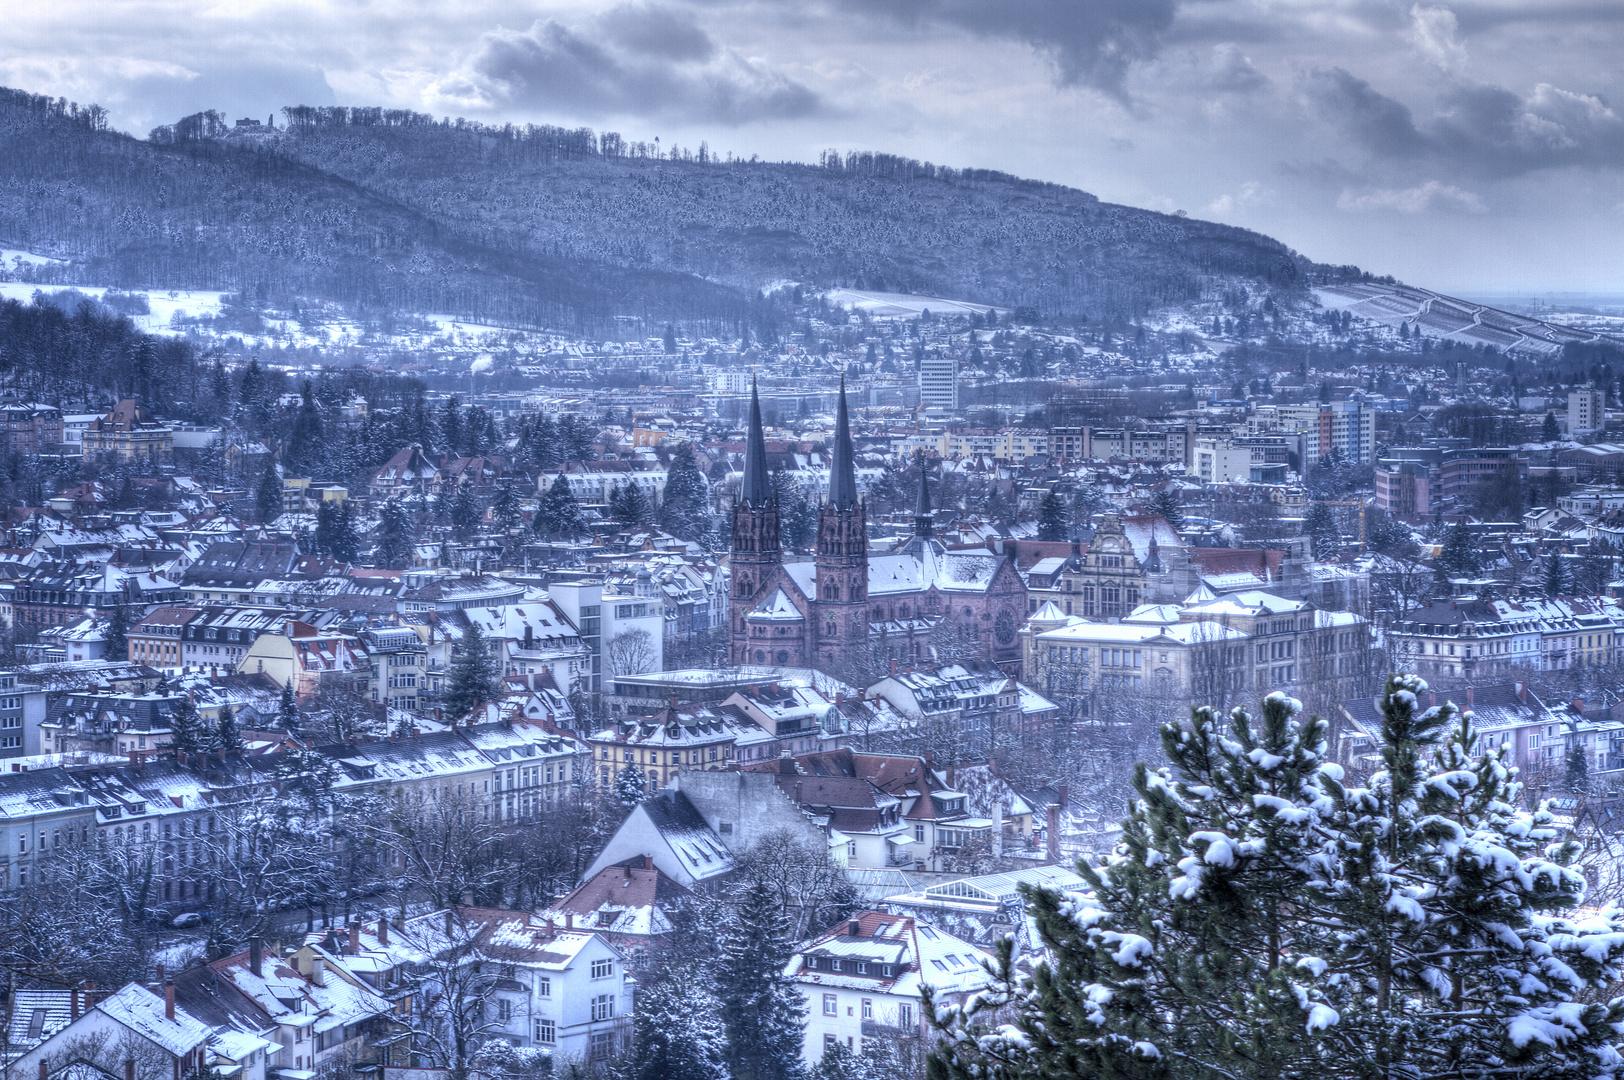 St. Johann Freiburg